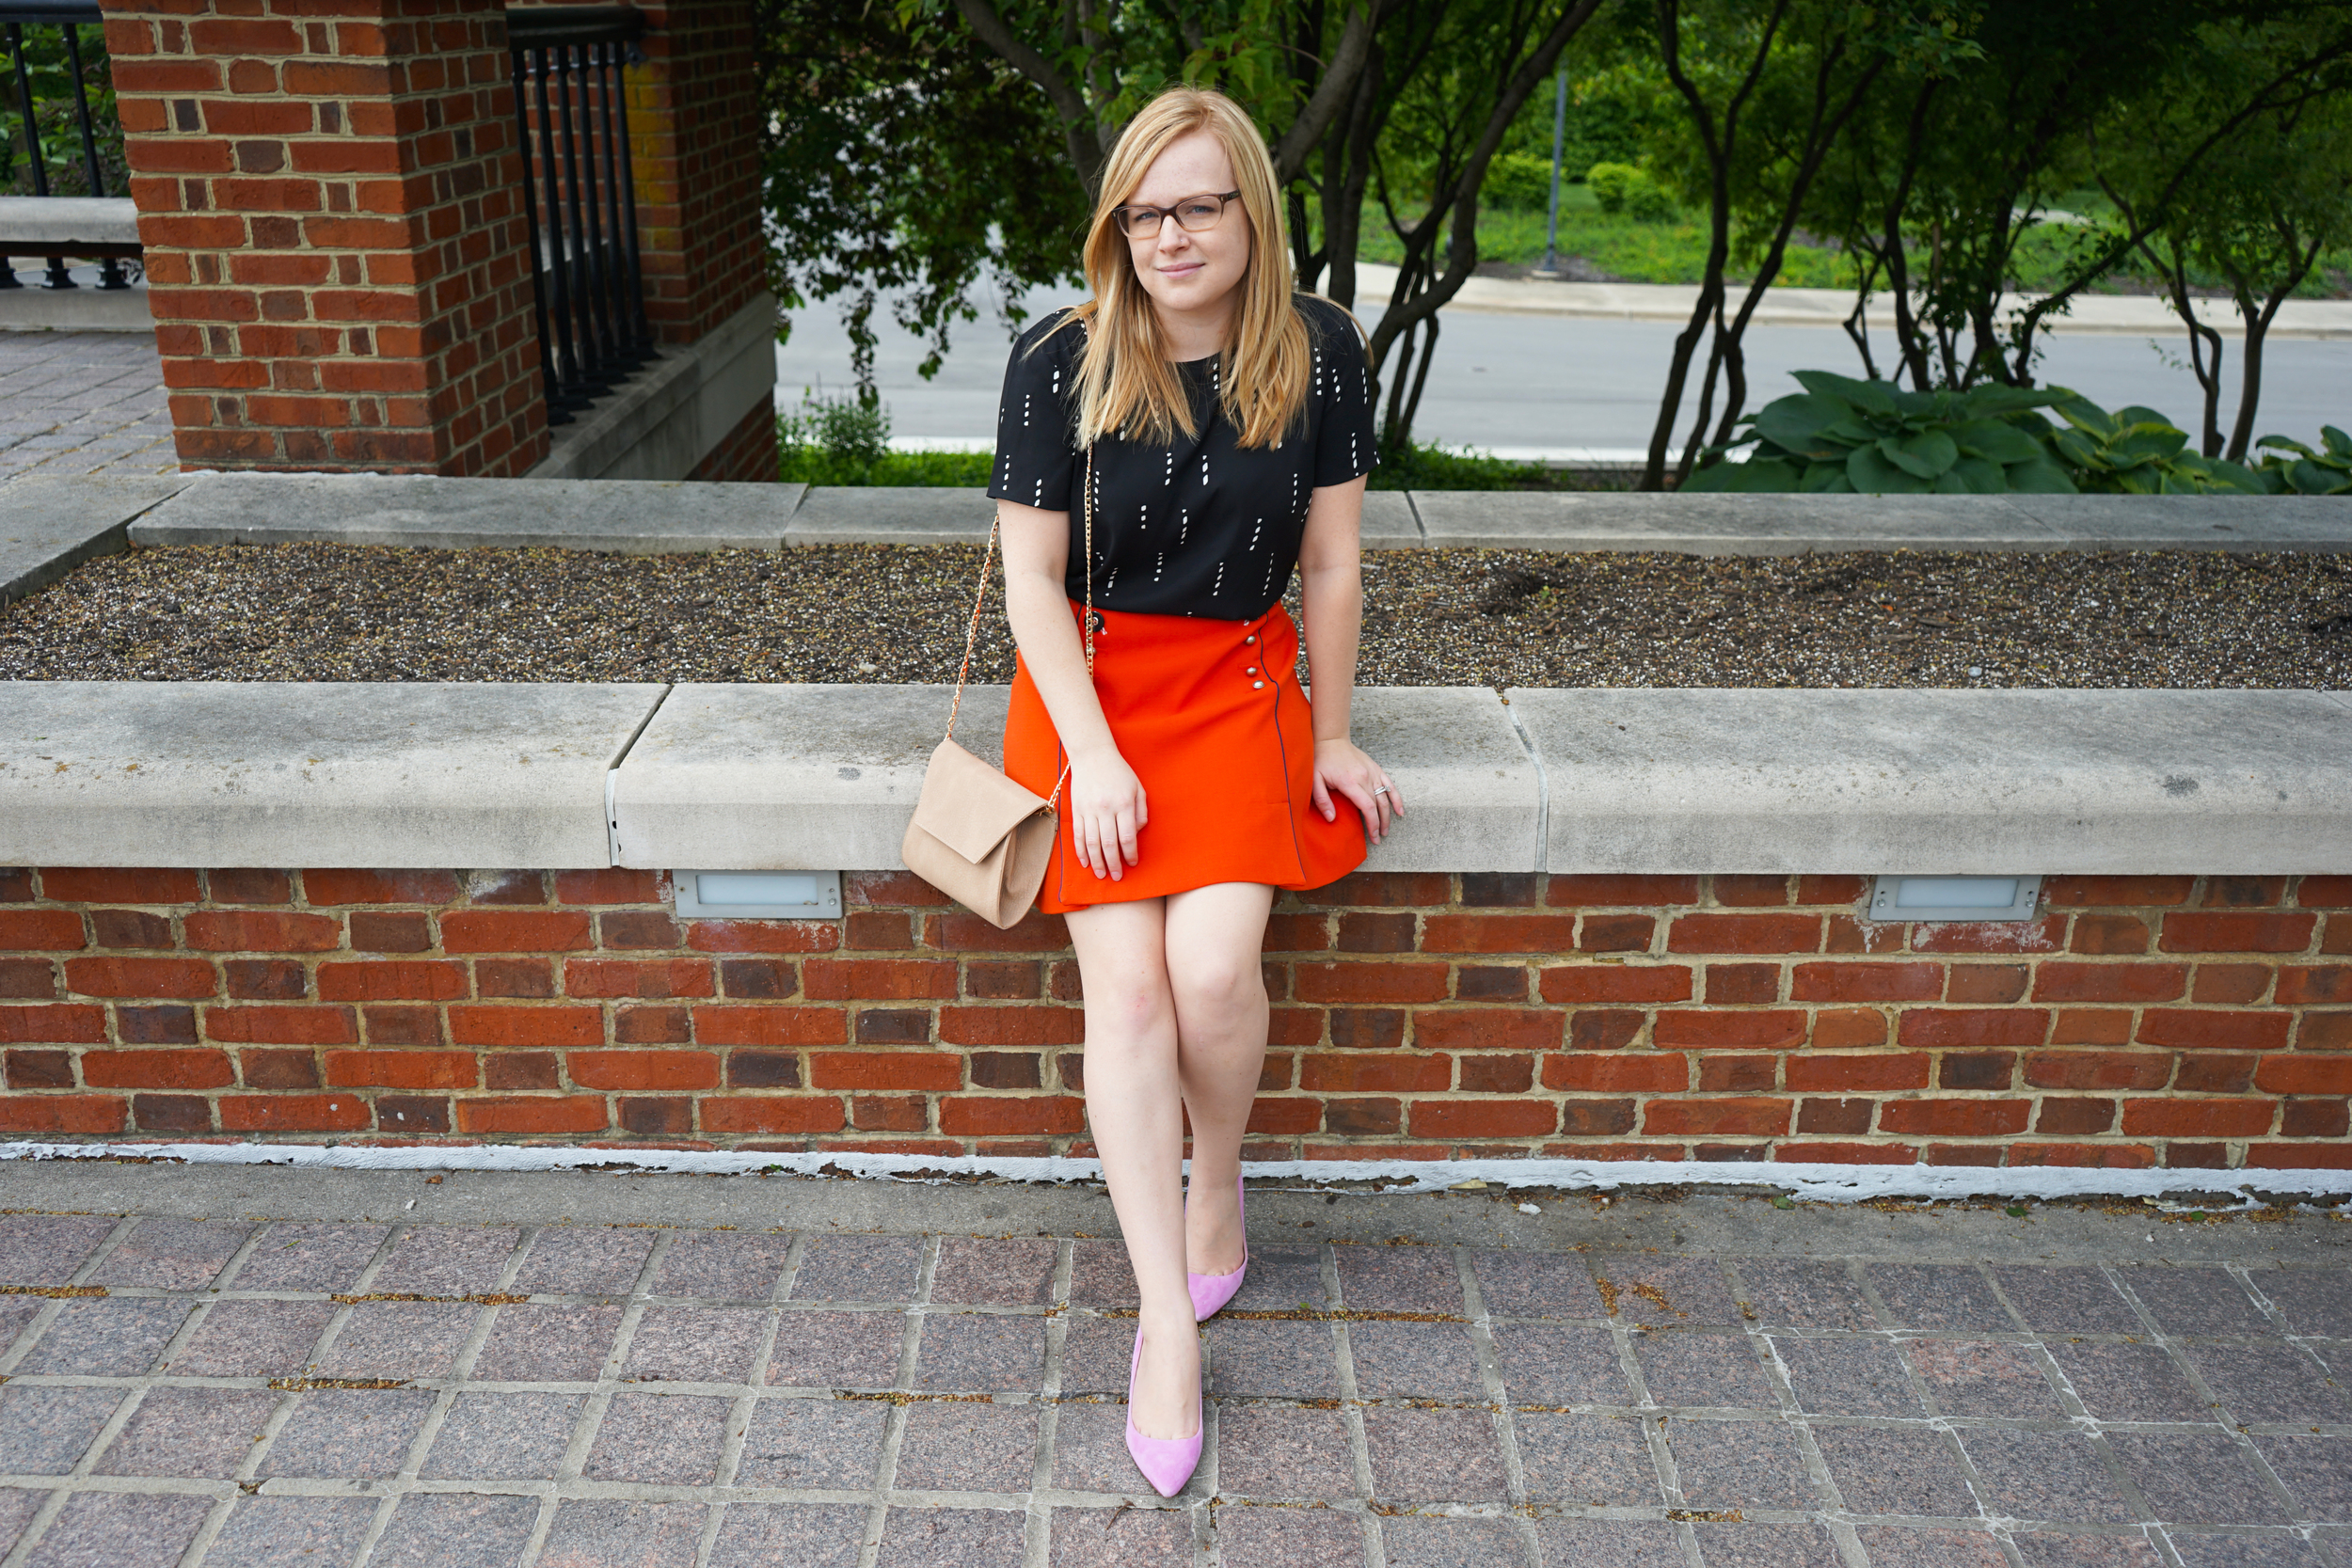 Ann Taylor Stitched Stripe Fluid Tee, Anthropologie Leifsdottir Regatta Skirt, J Crew dulci kitten heels, Urban Expressions Carissa crossbody - Maggie a la Mode